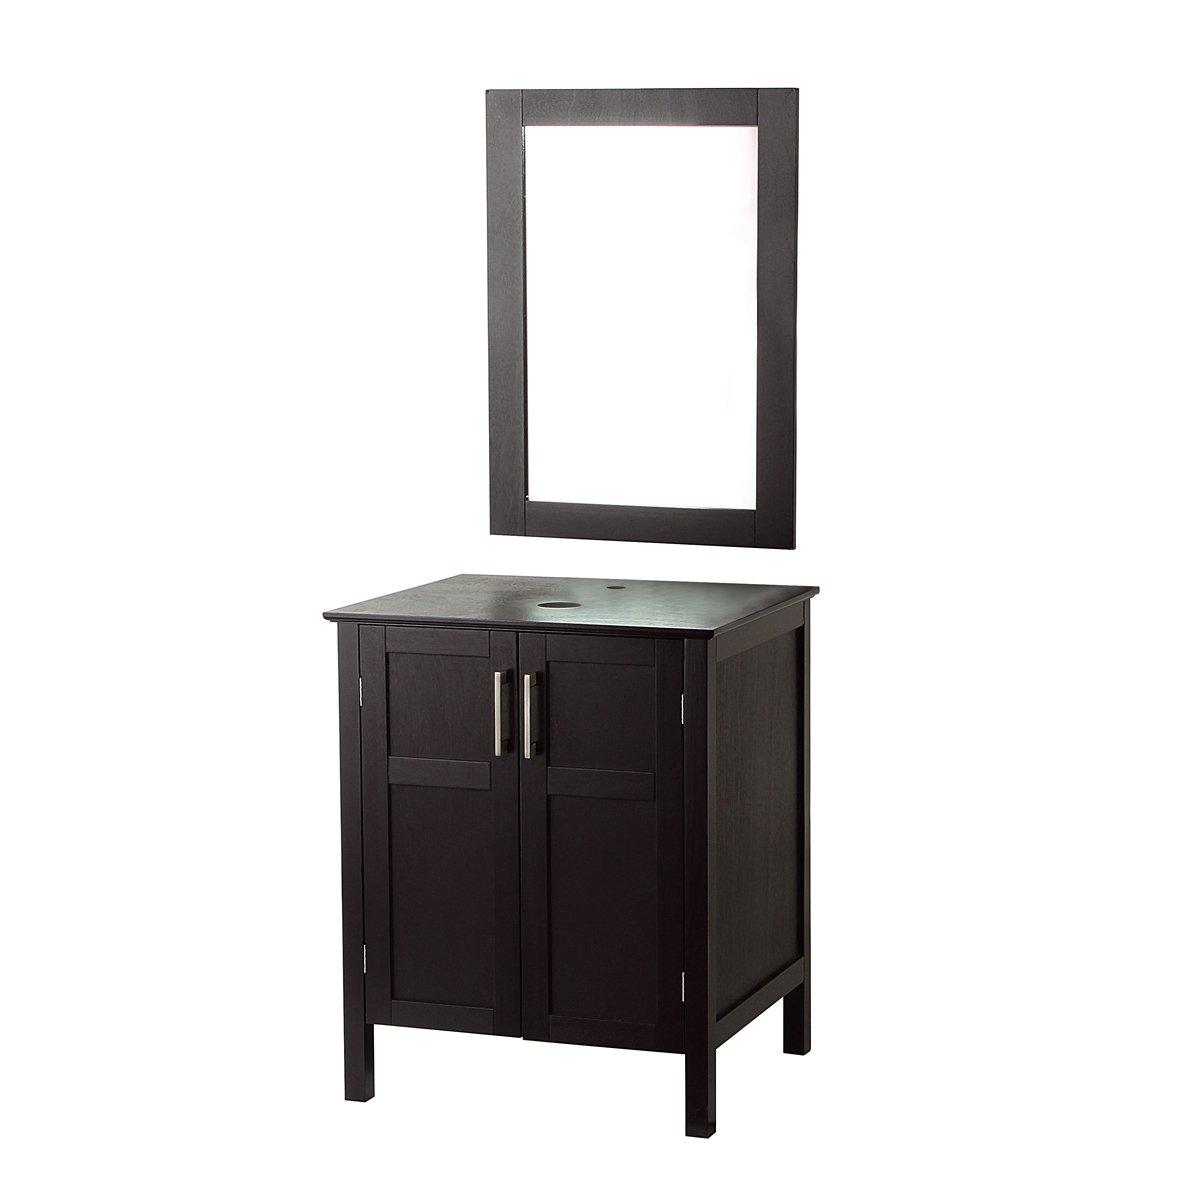 AECOJOY Bathroom Cabinet with Mirror, Espresso Wood Vanity Units, Morden Sink Stand Pedestal